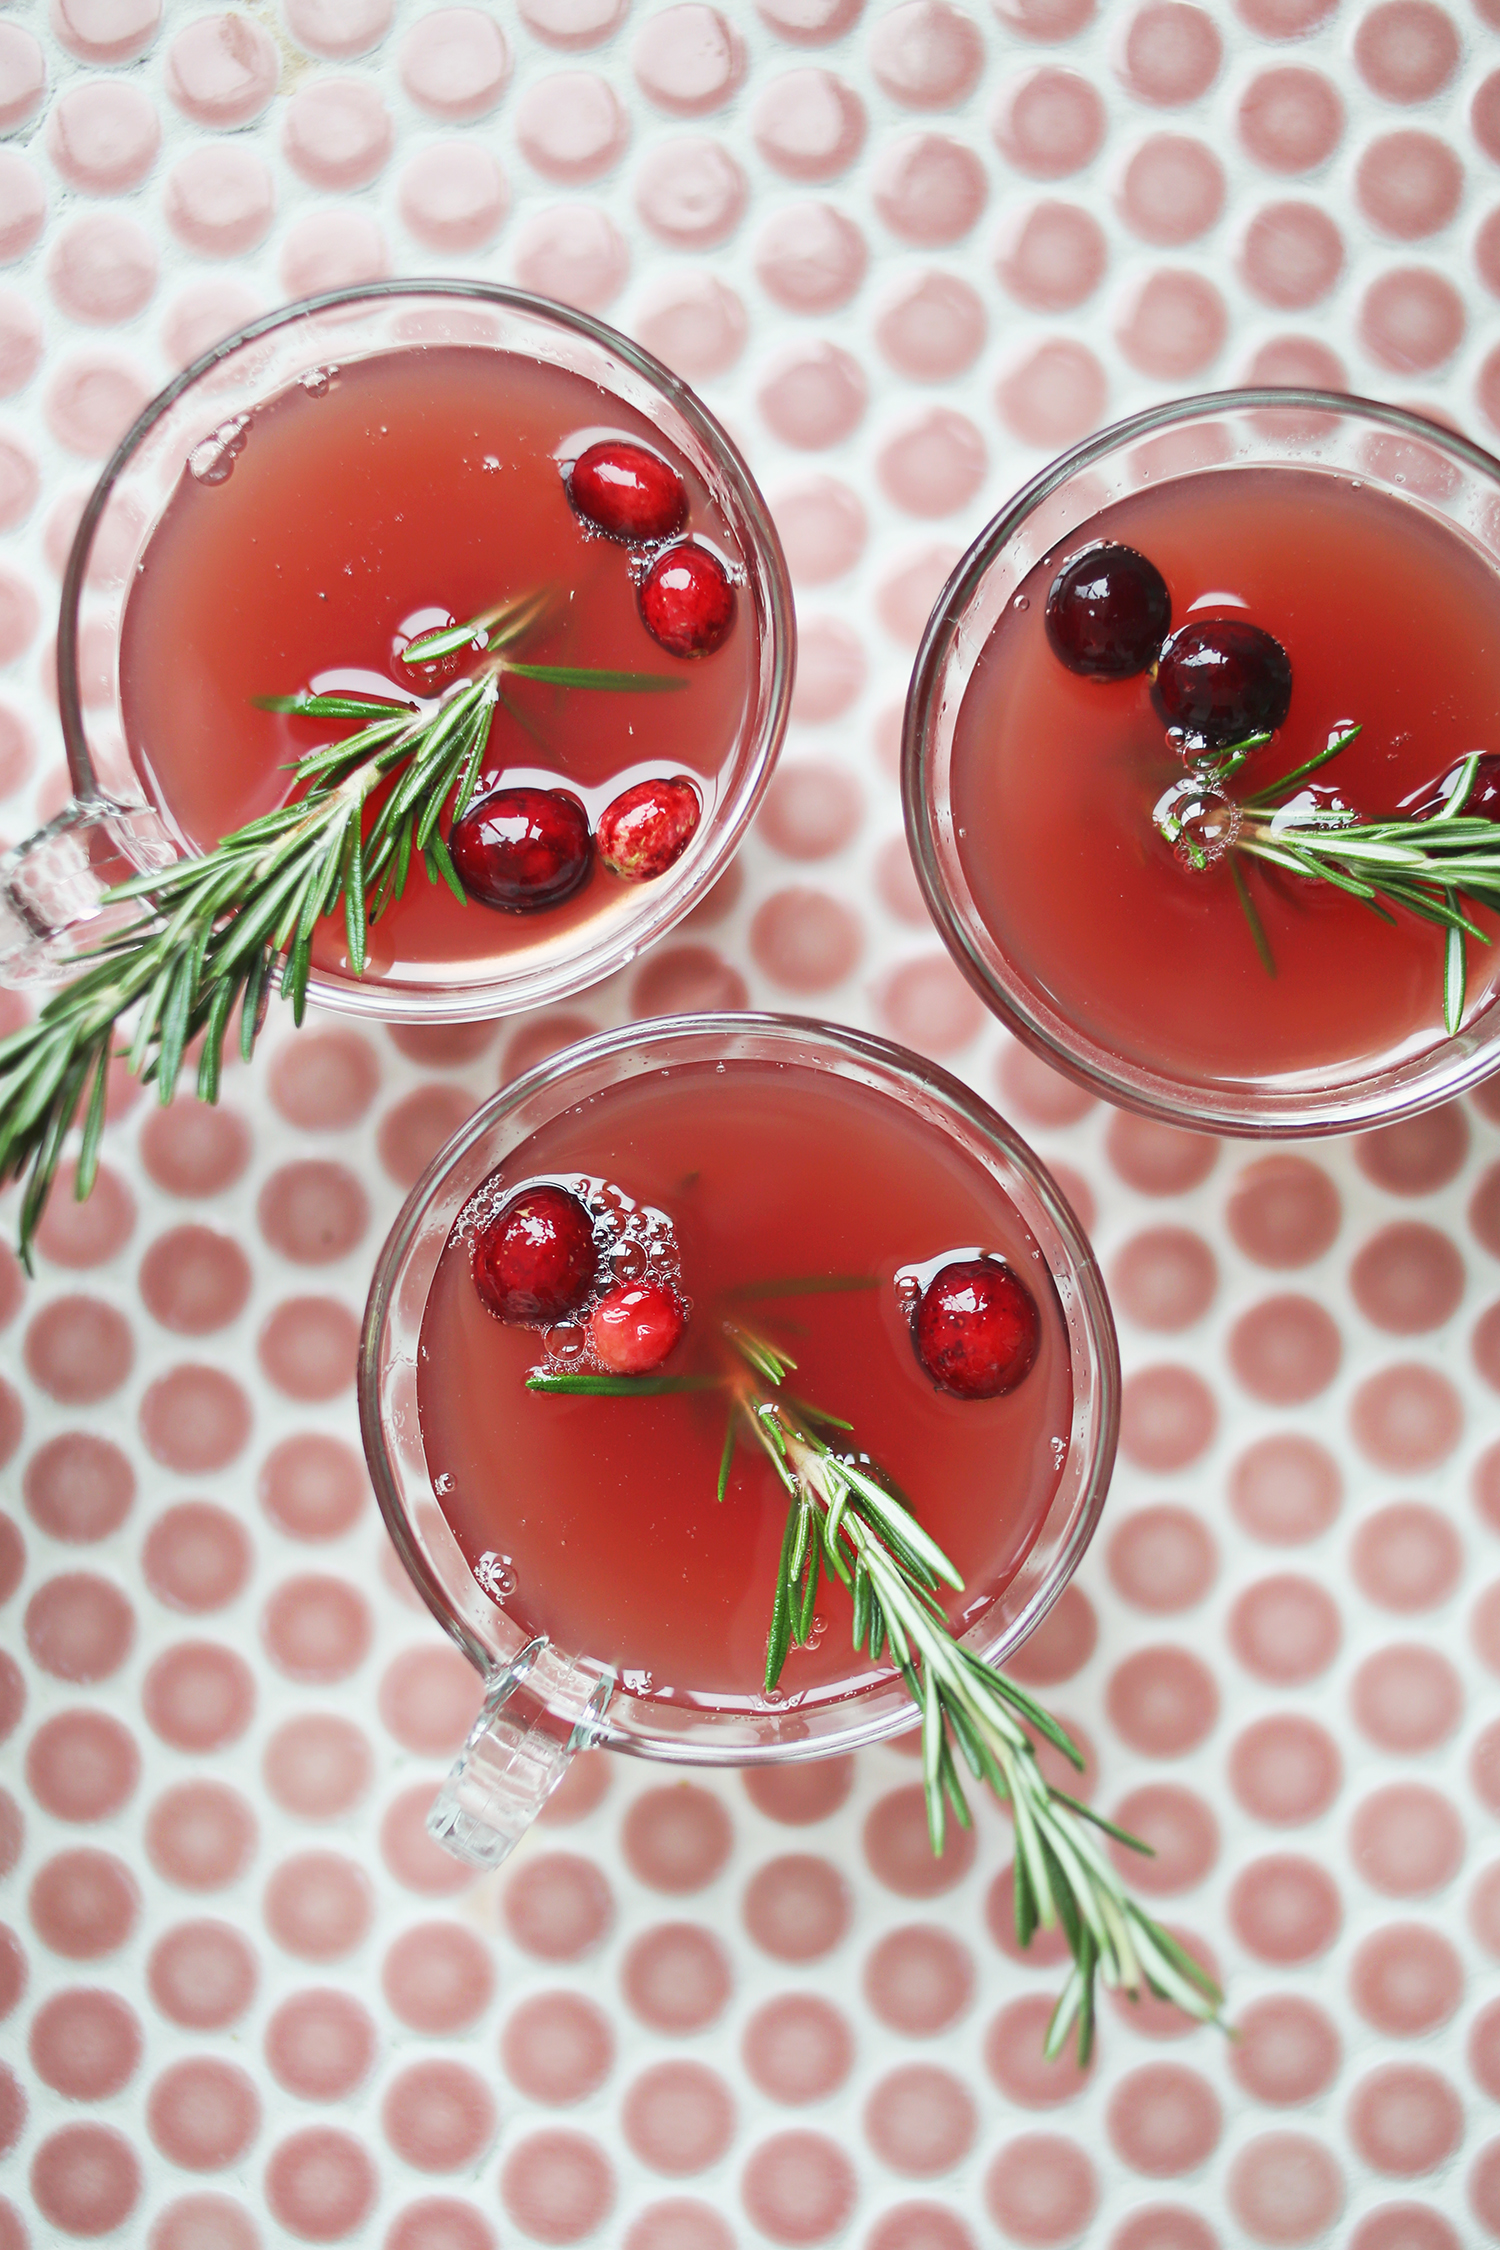 Mistletoe Holiday Punch